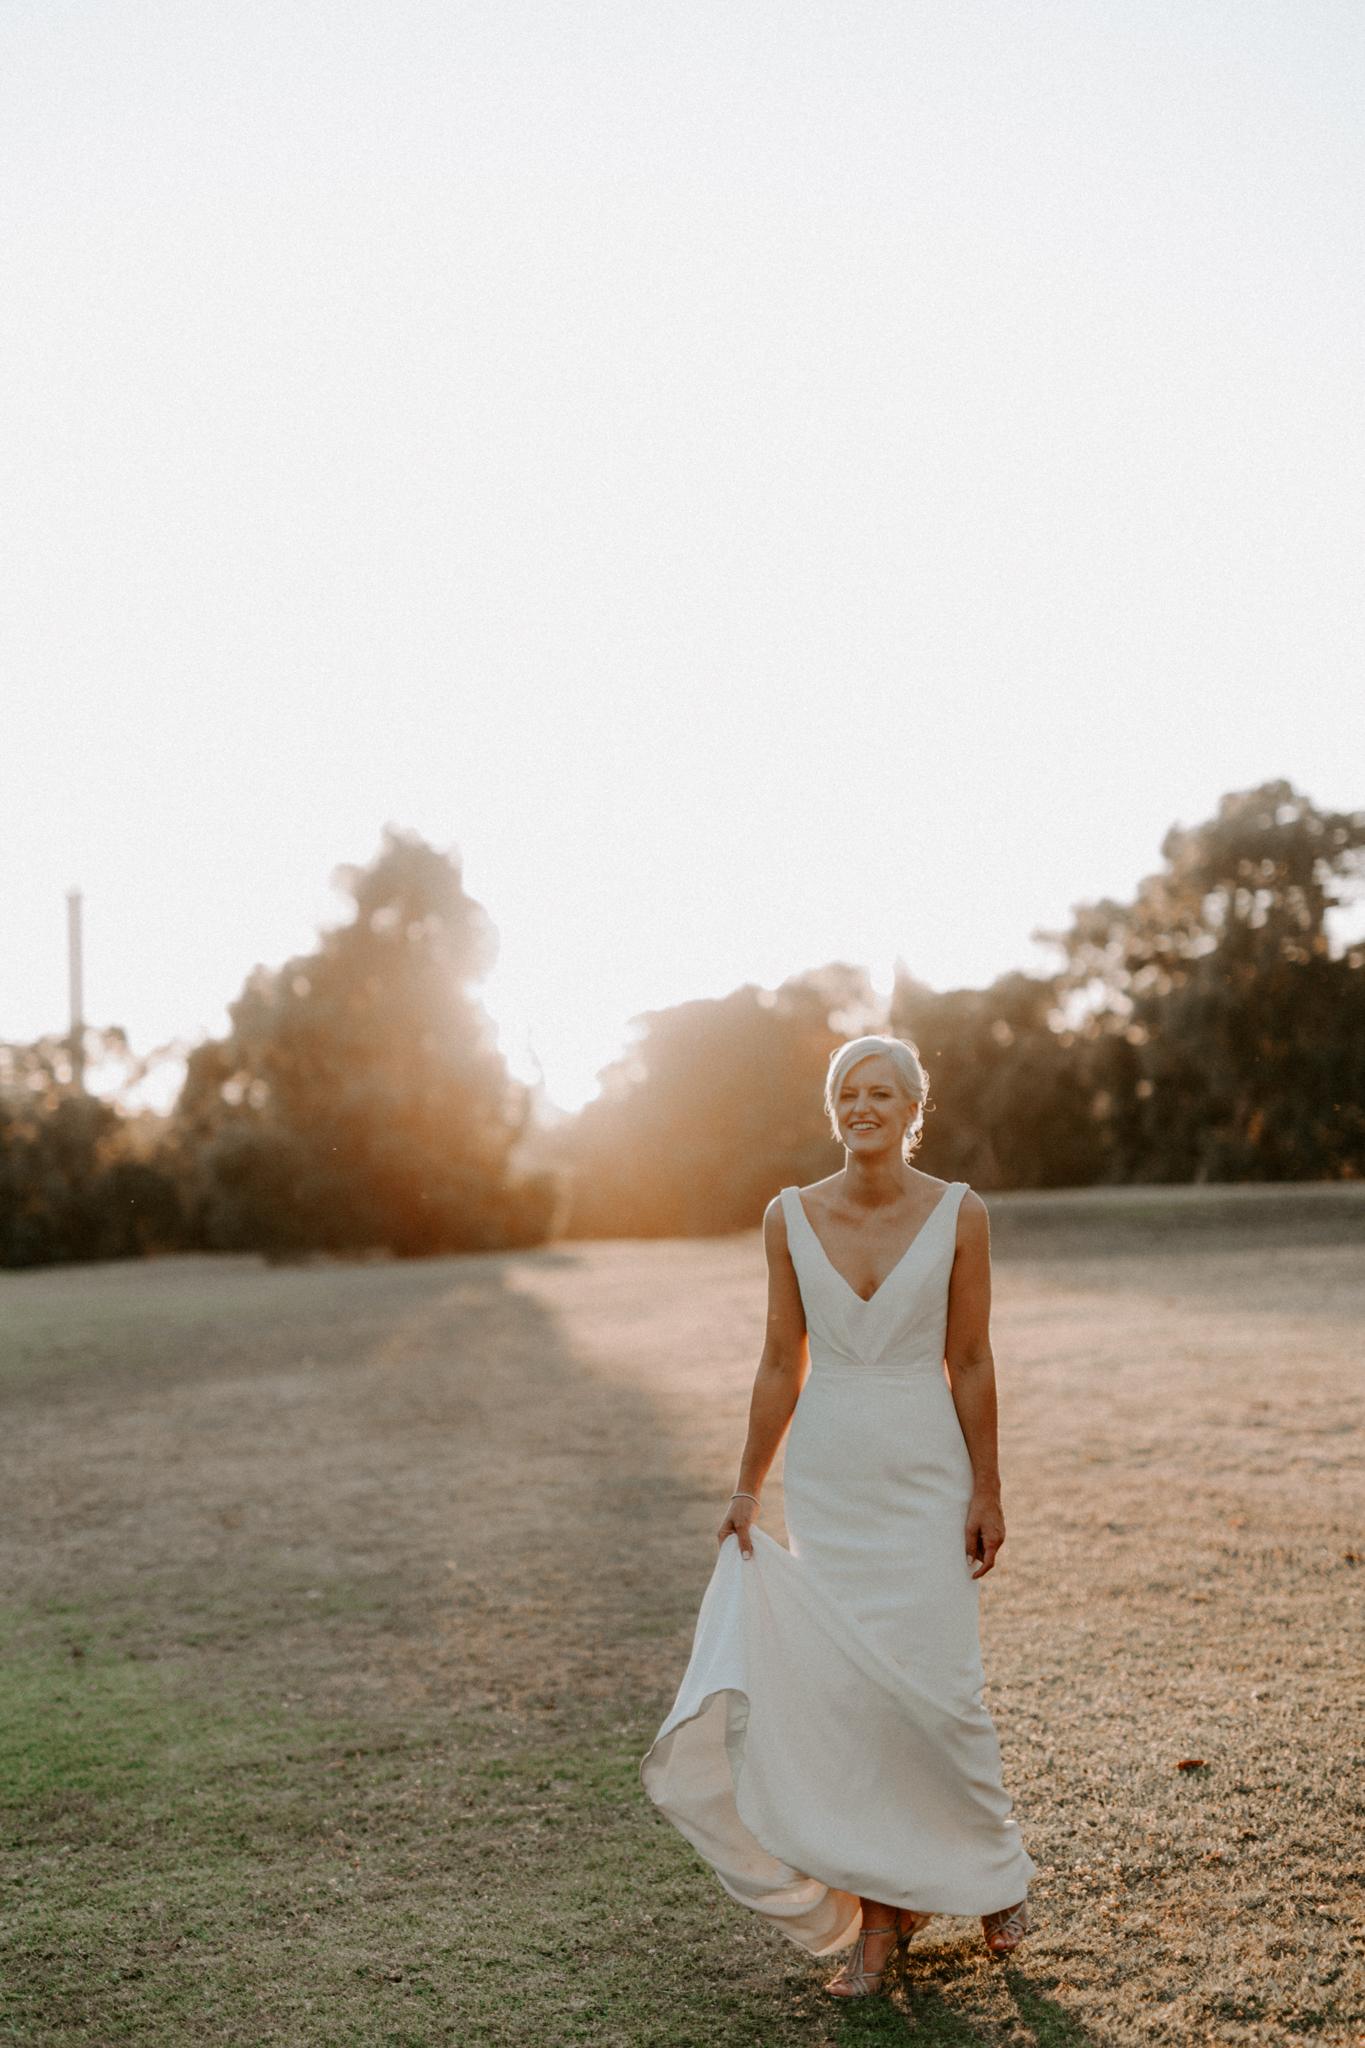 St-Kilda-Garden-Wedding-Emotions-and-Math-Photograph-229.jpg